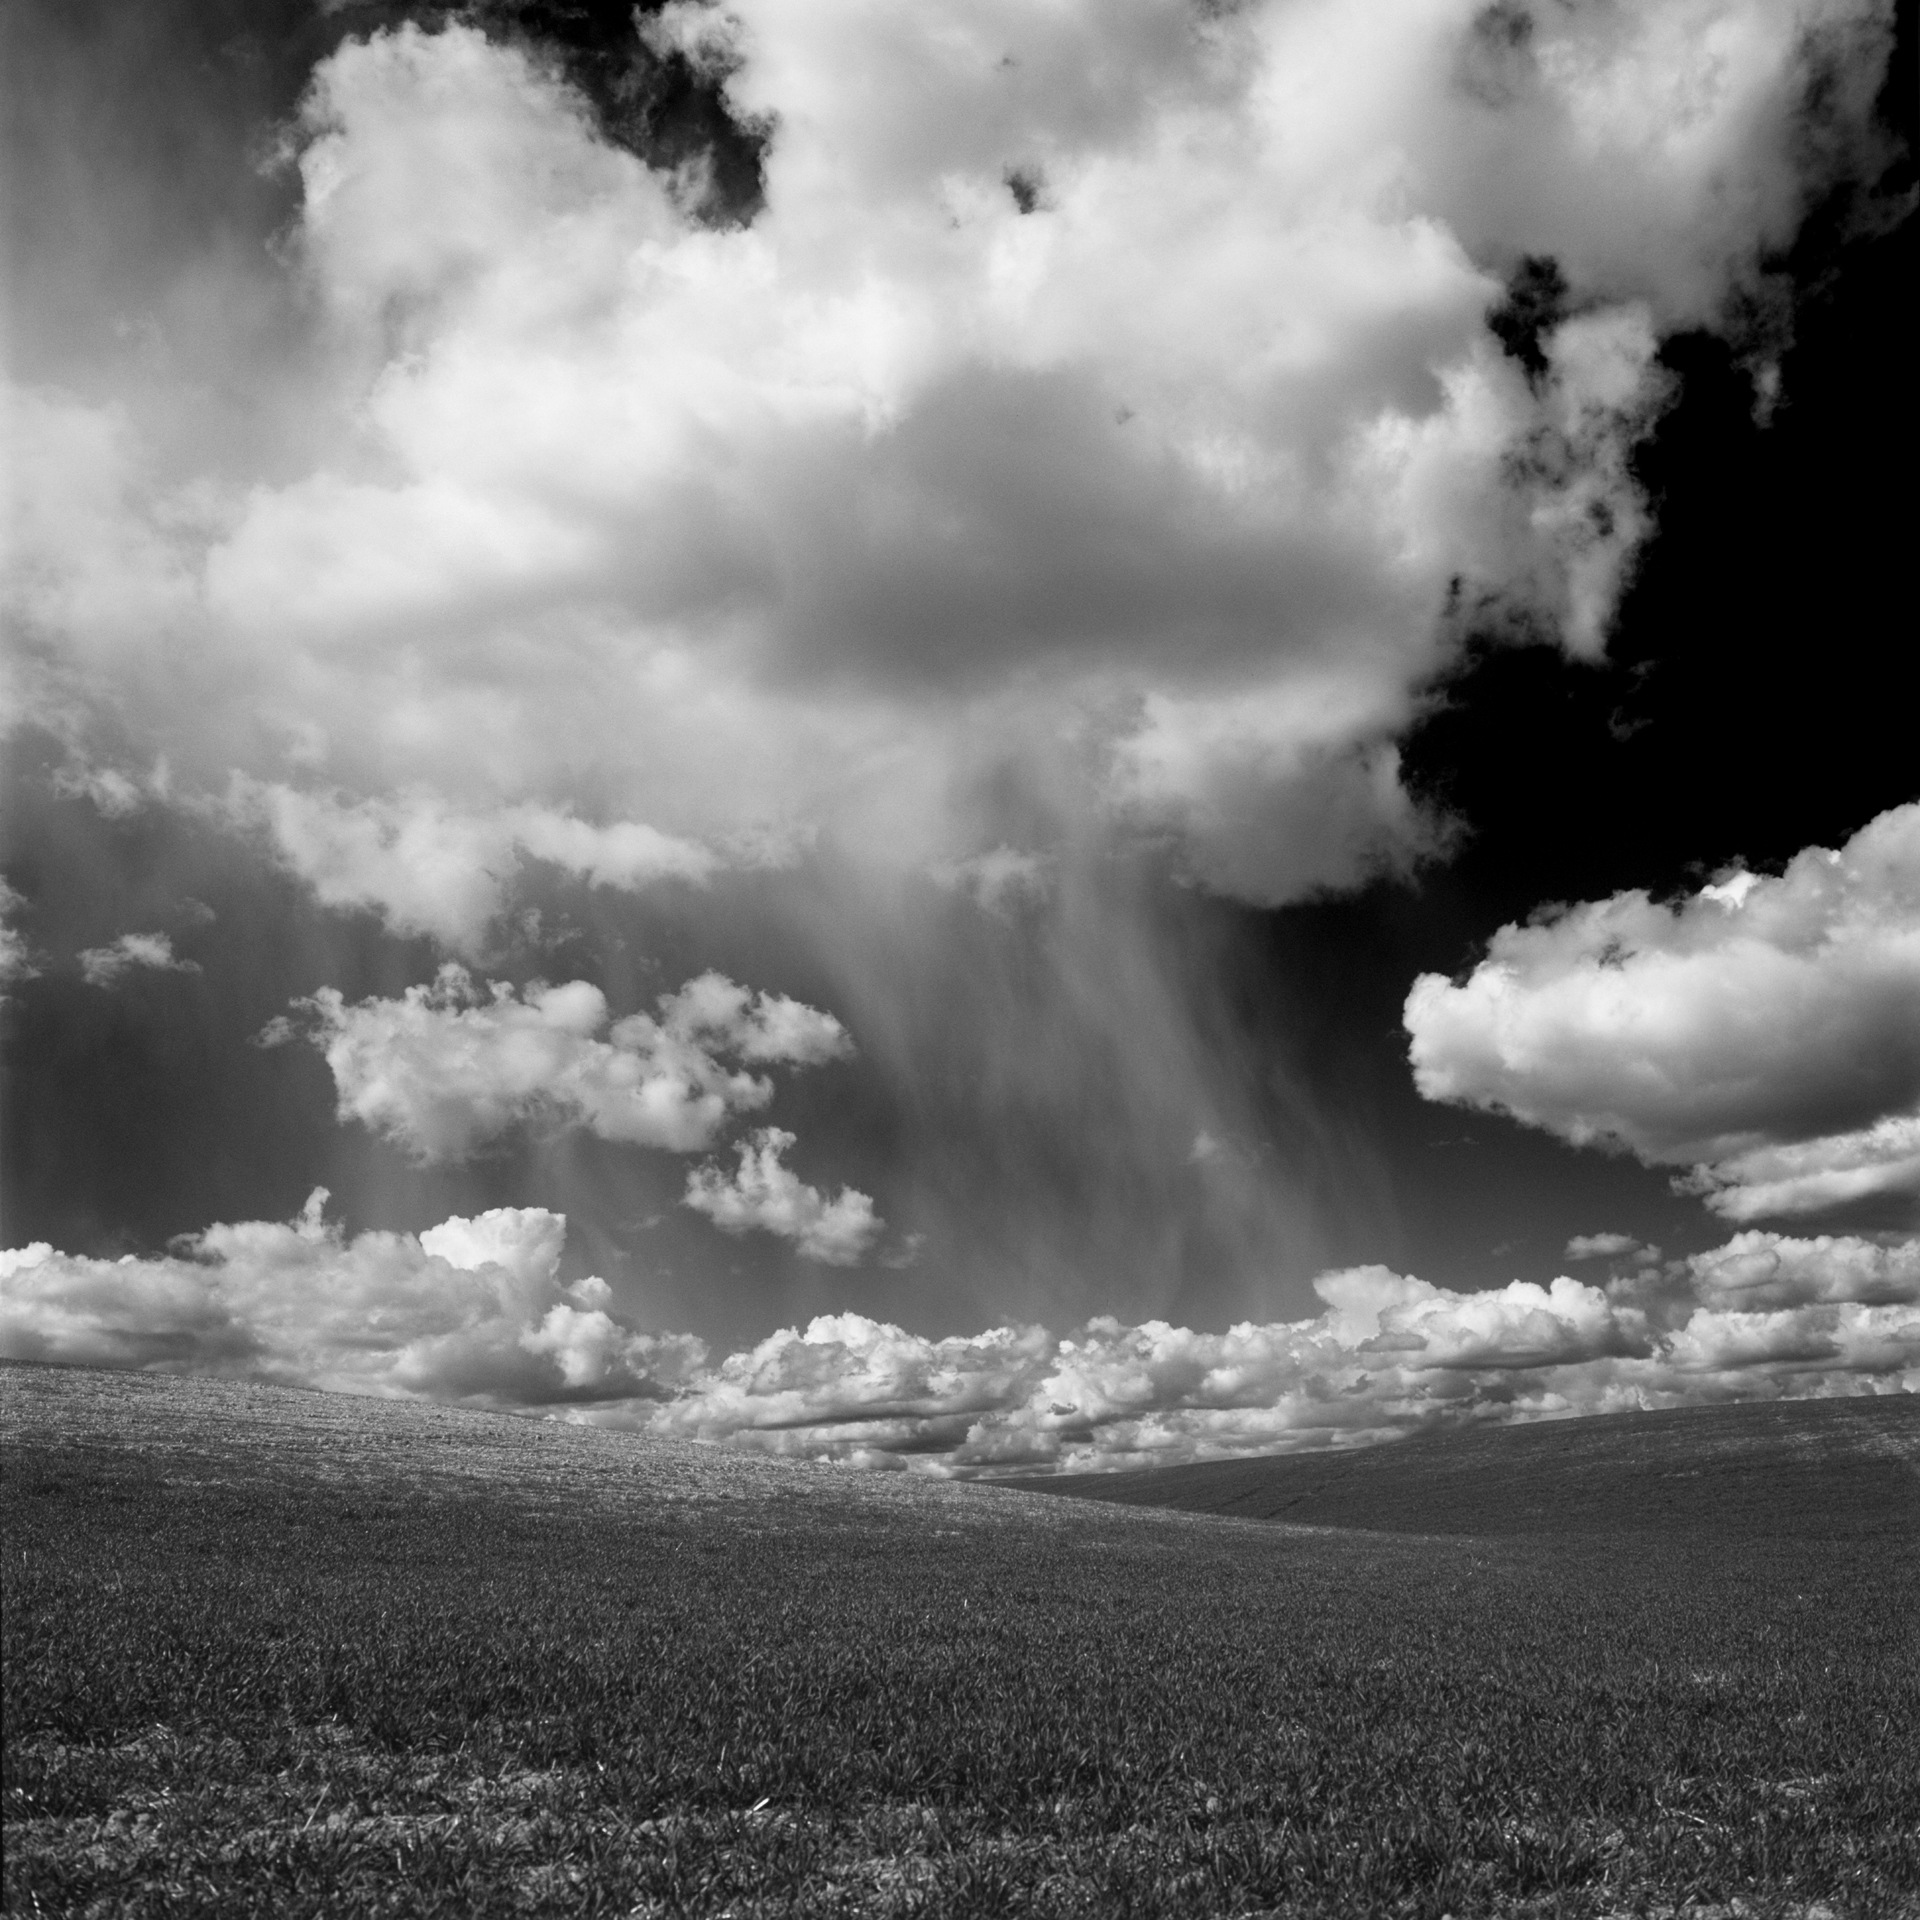 cloudghost_bw1920.jpg